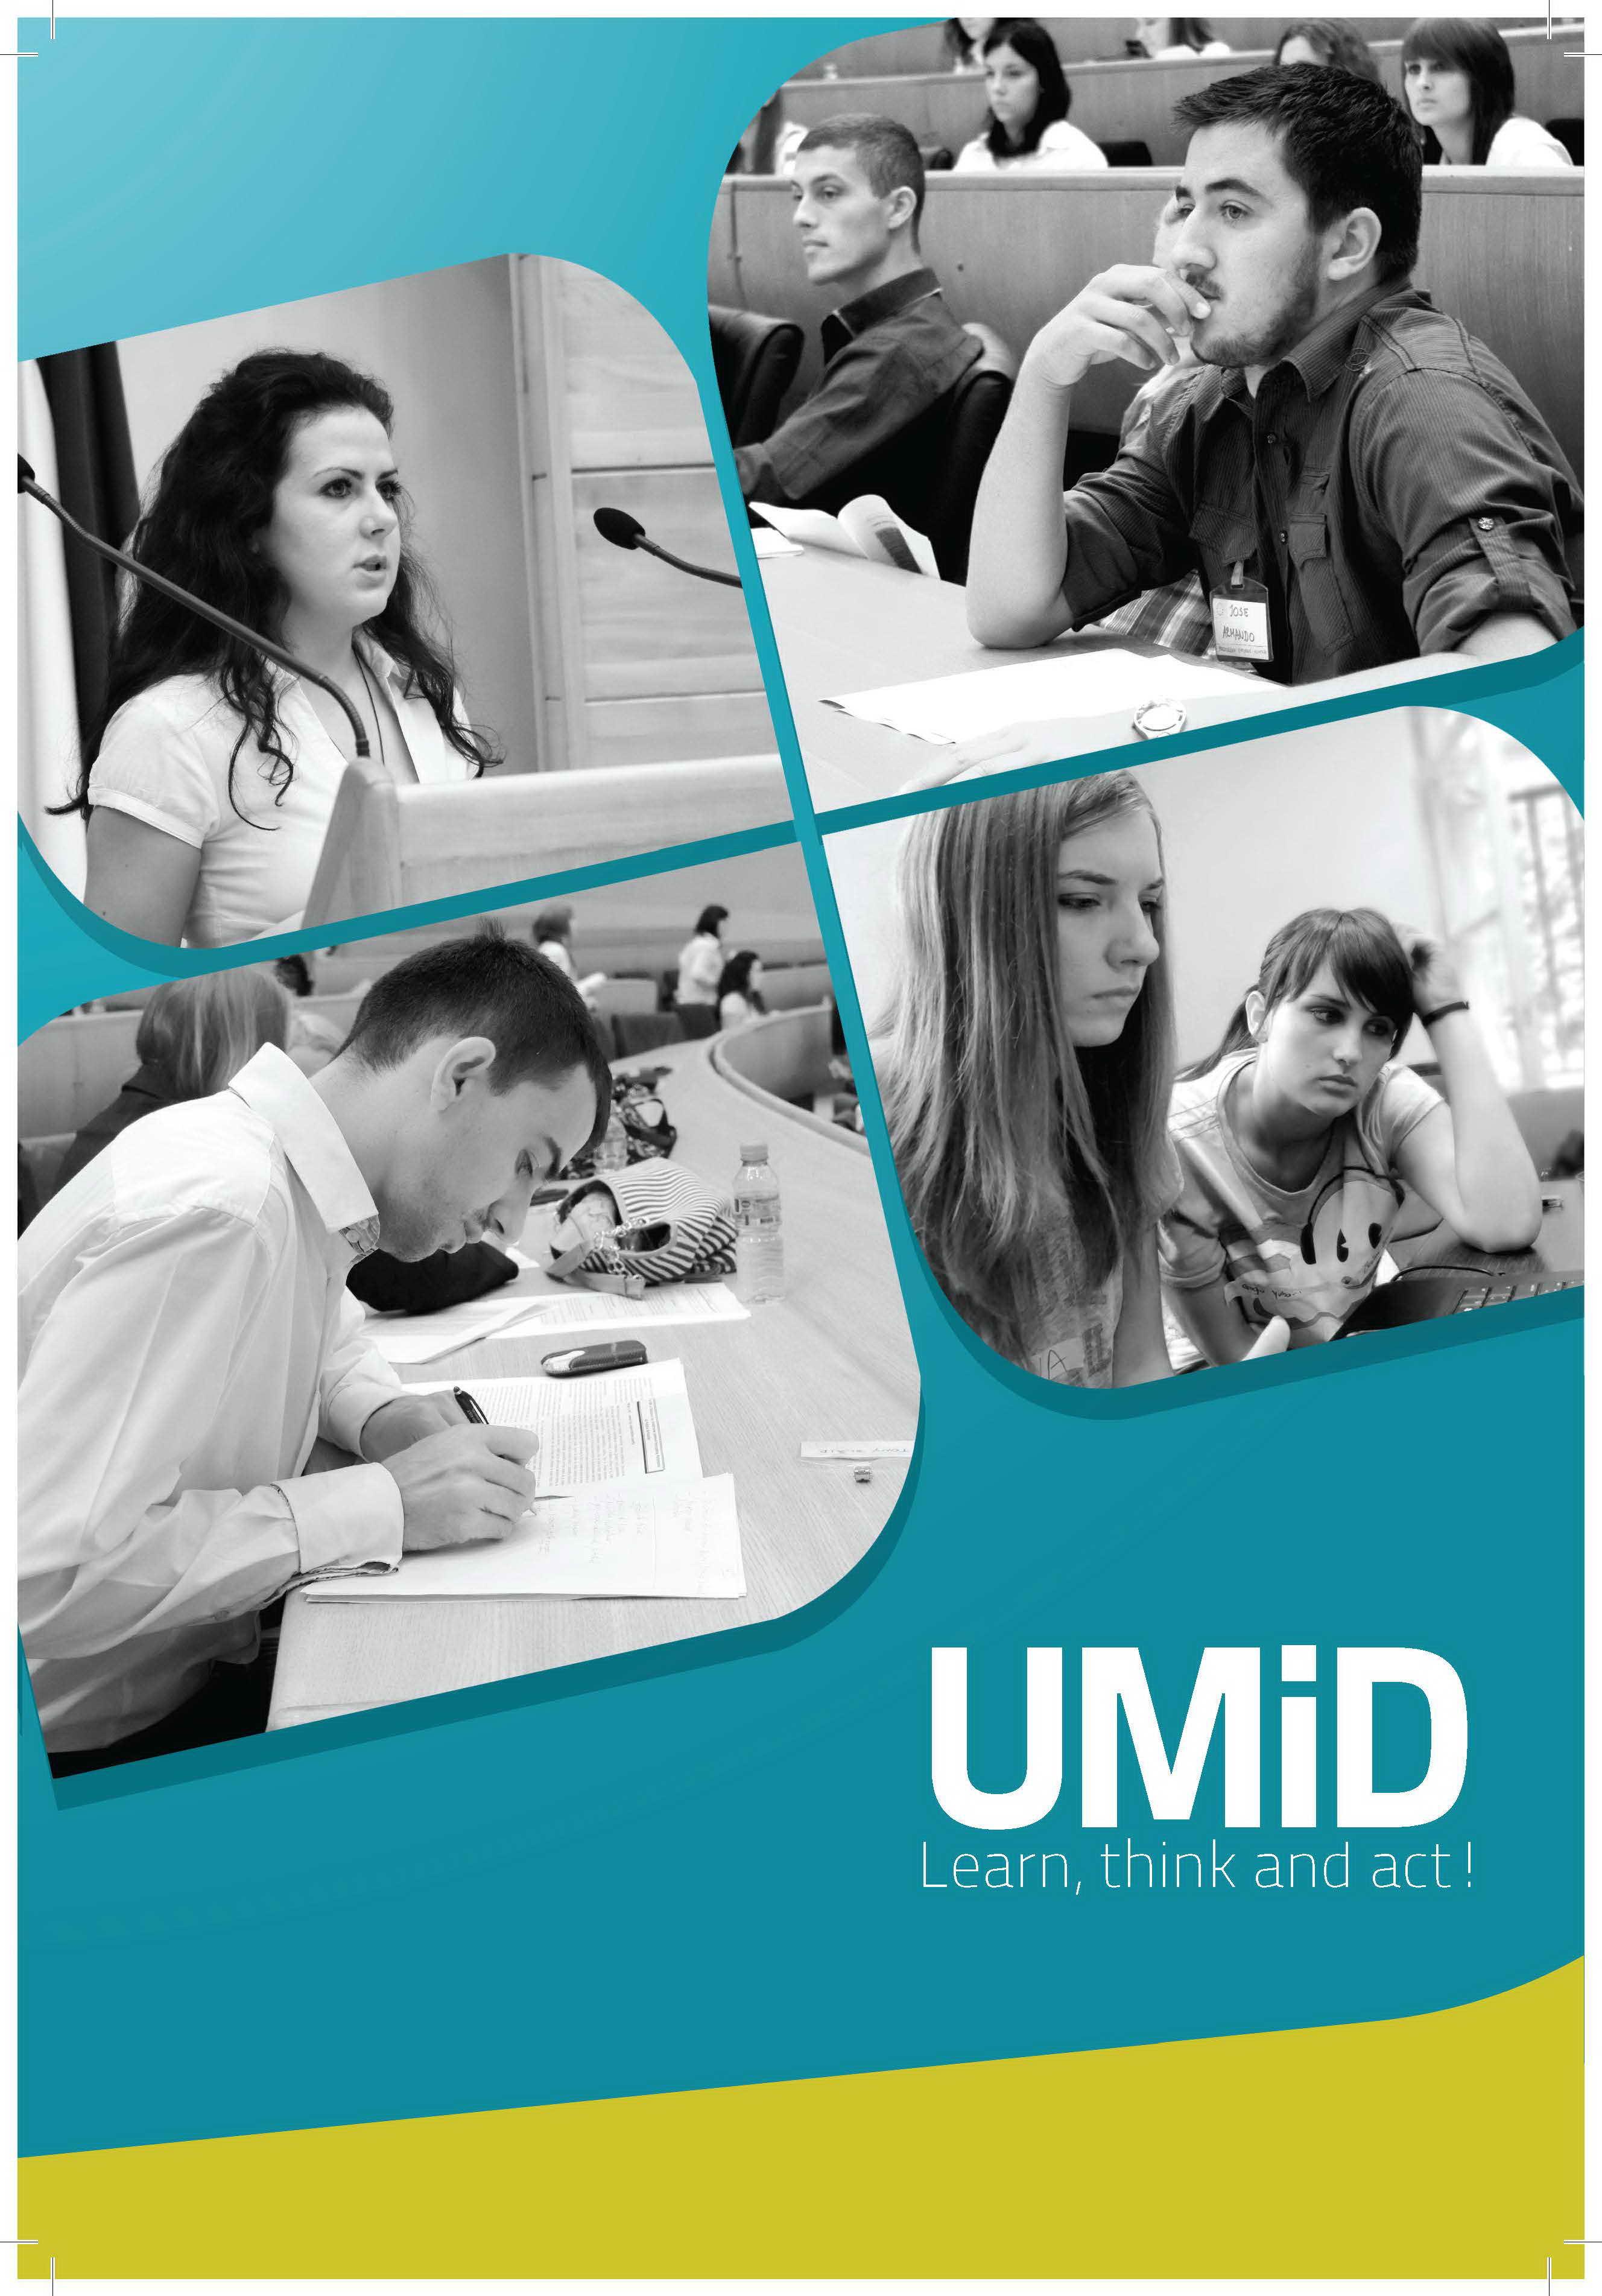 UMiD - Uci, misli i djeluj (Learn, think and act) - brochure